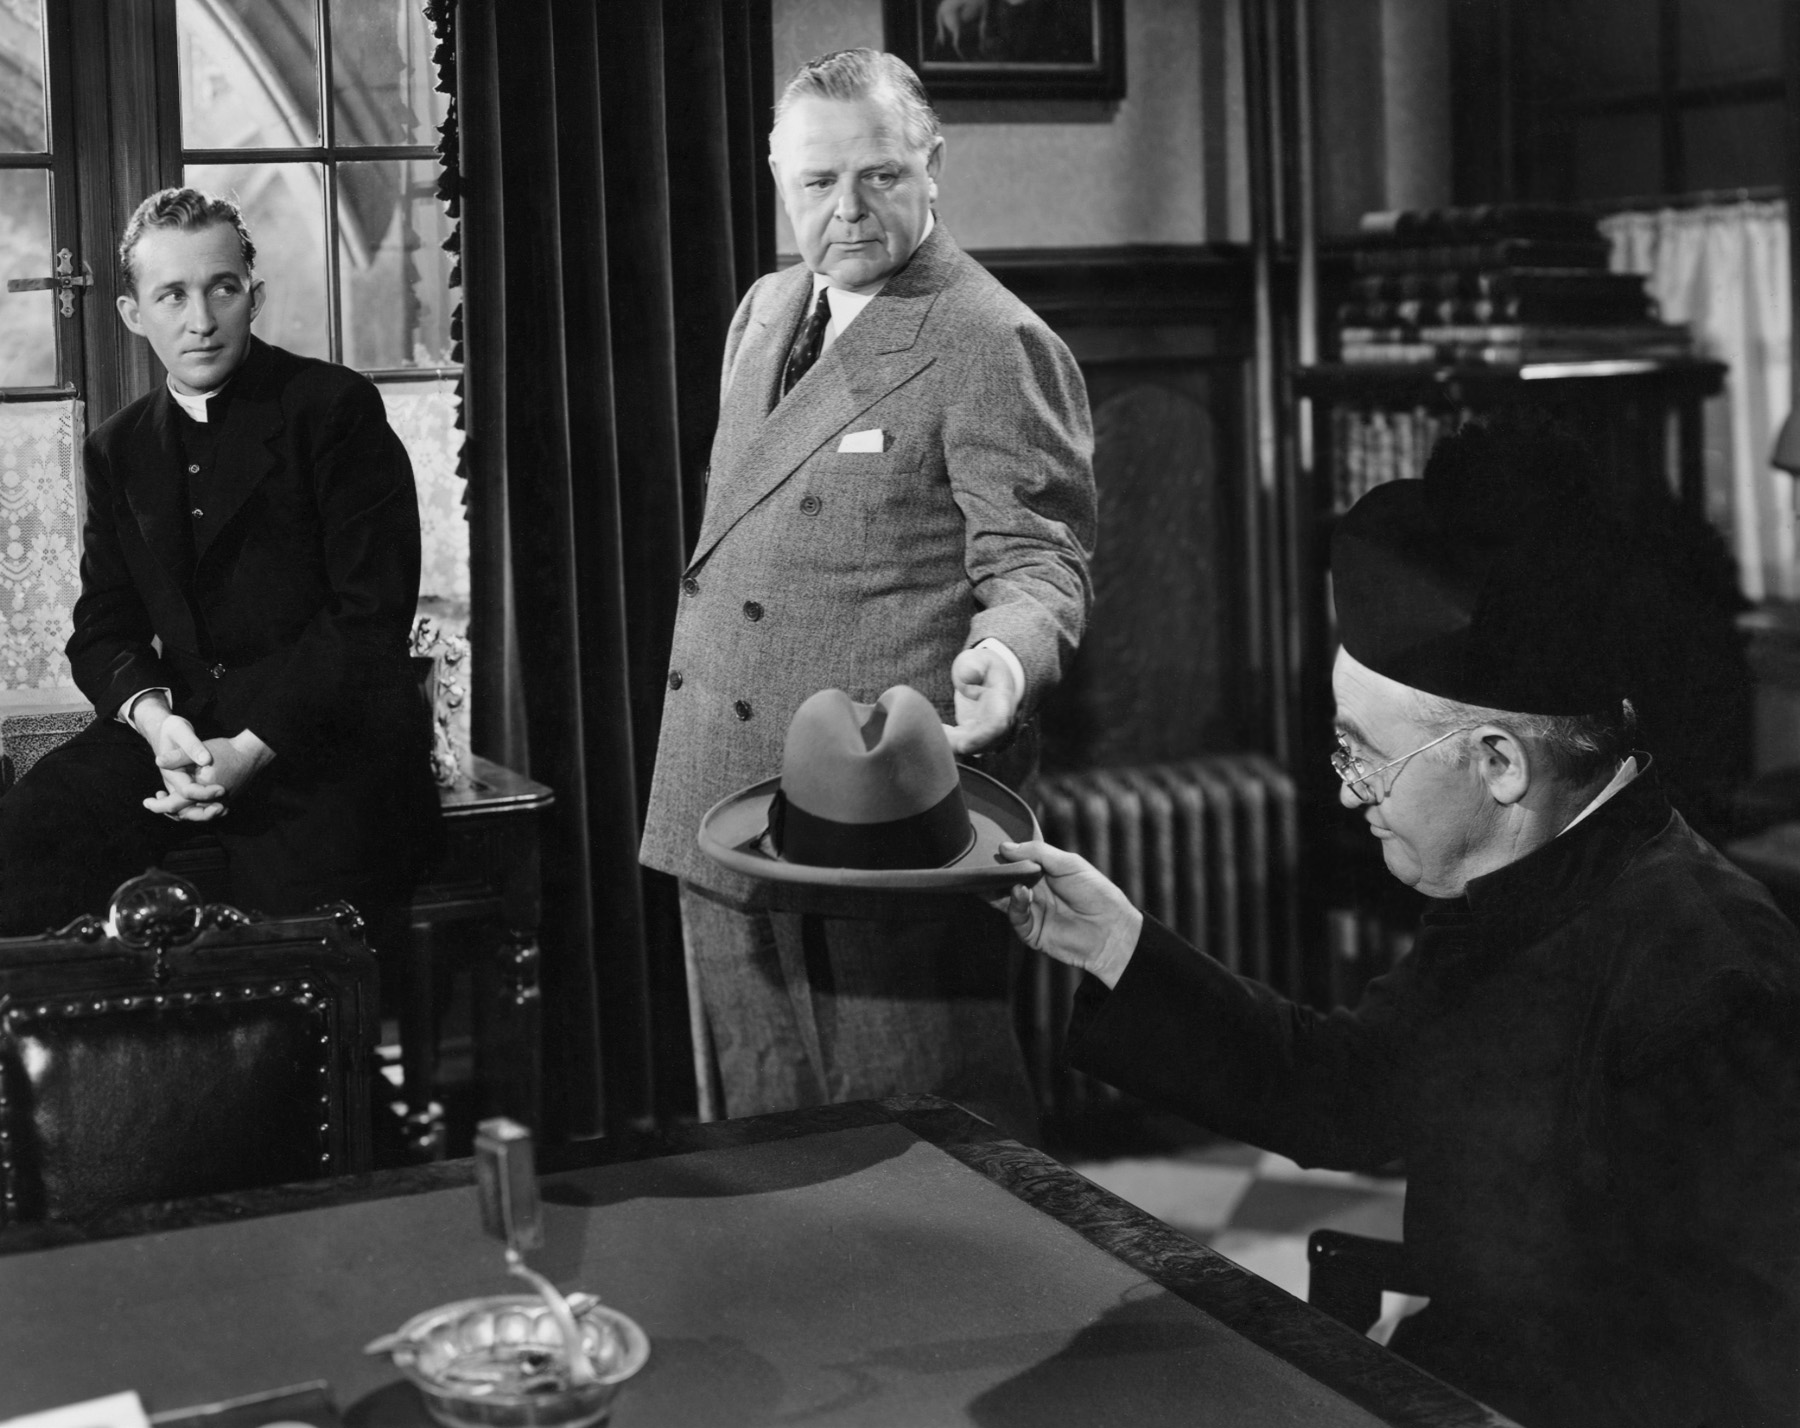 bing crosby, gene lockhart & barry fitzgerald - going my way 1944